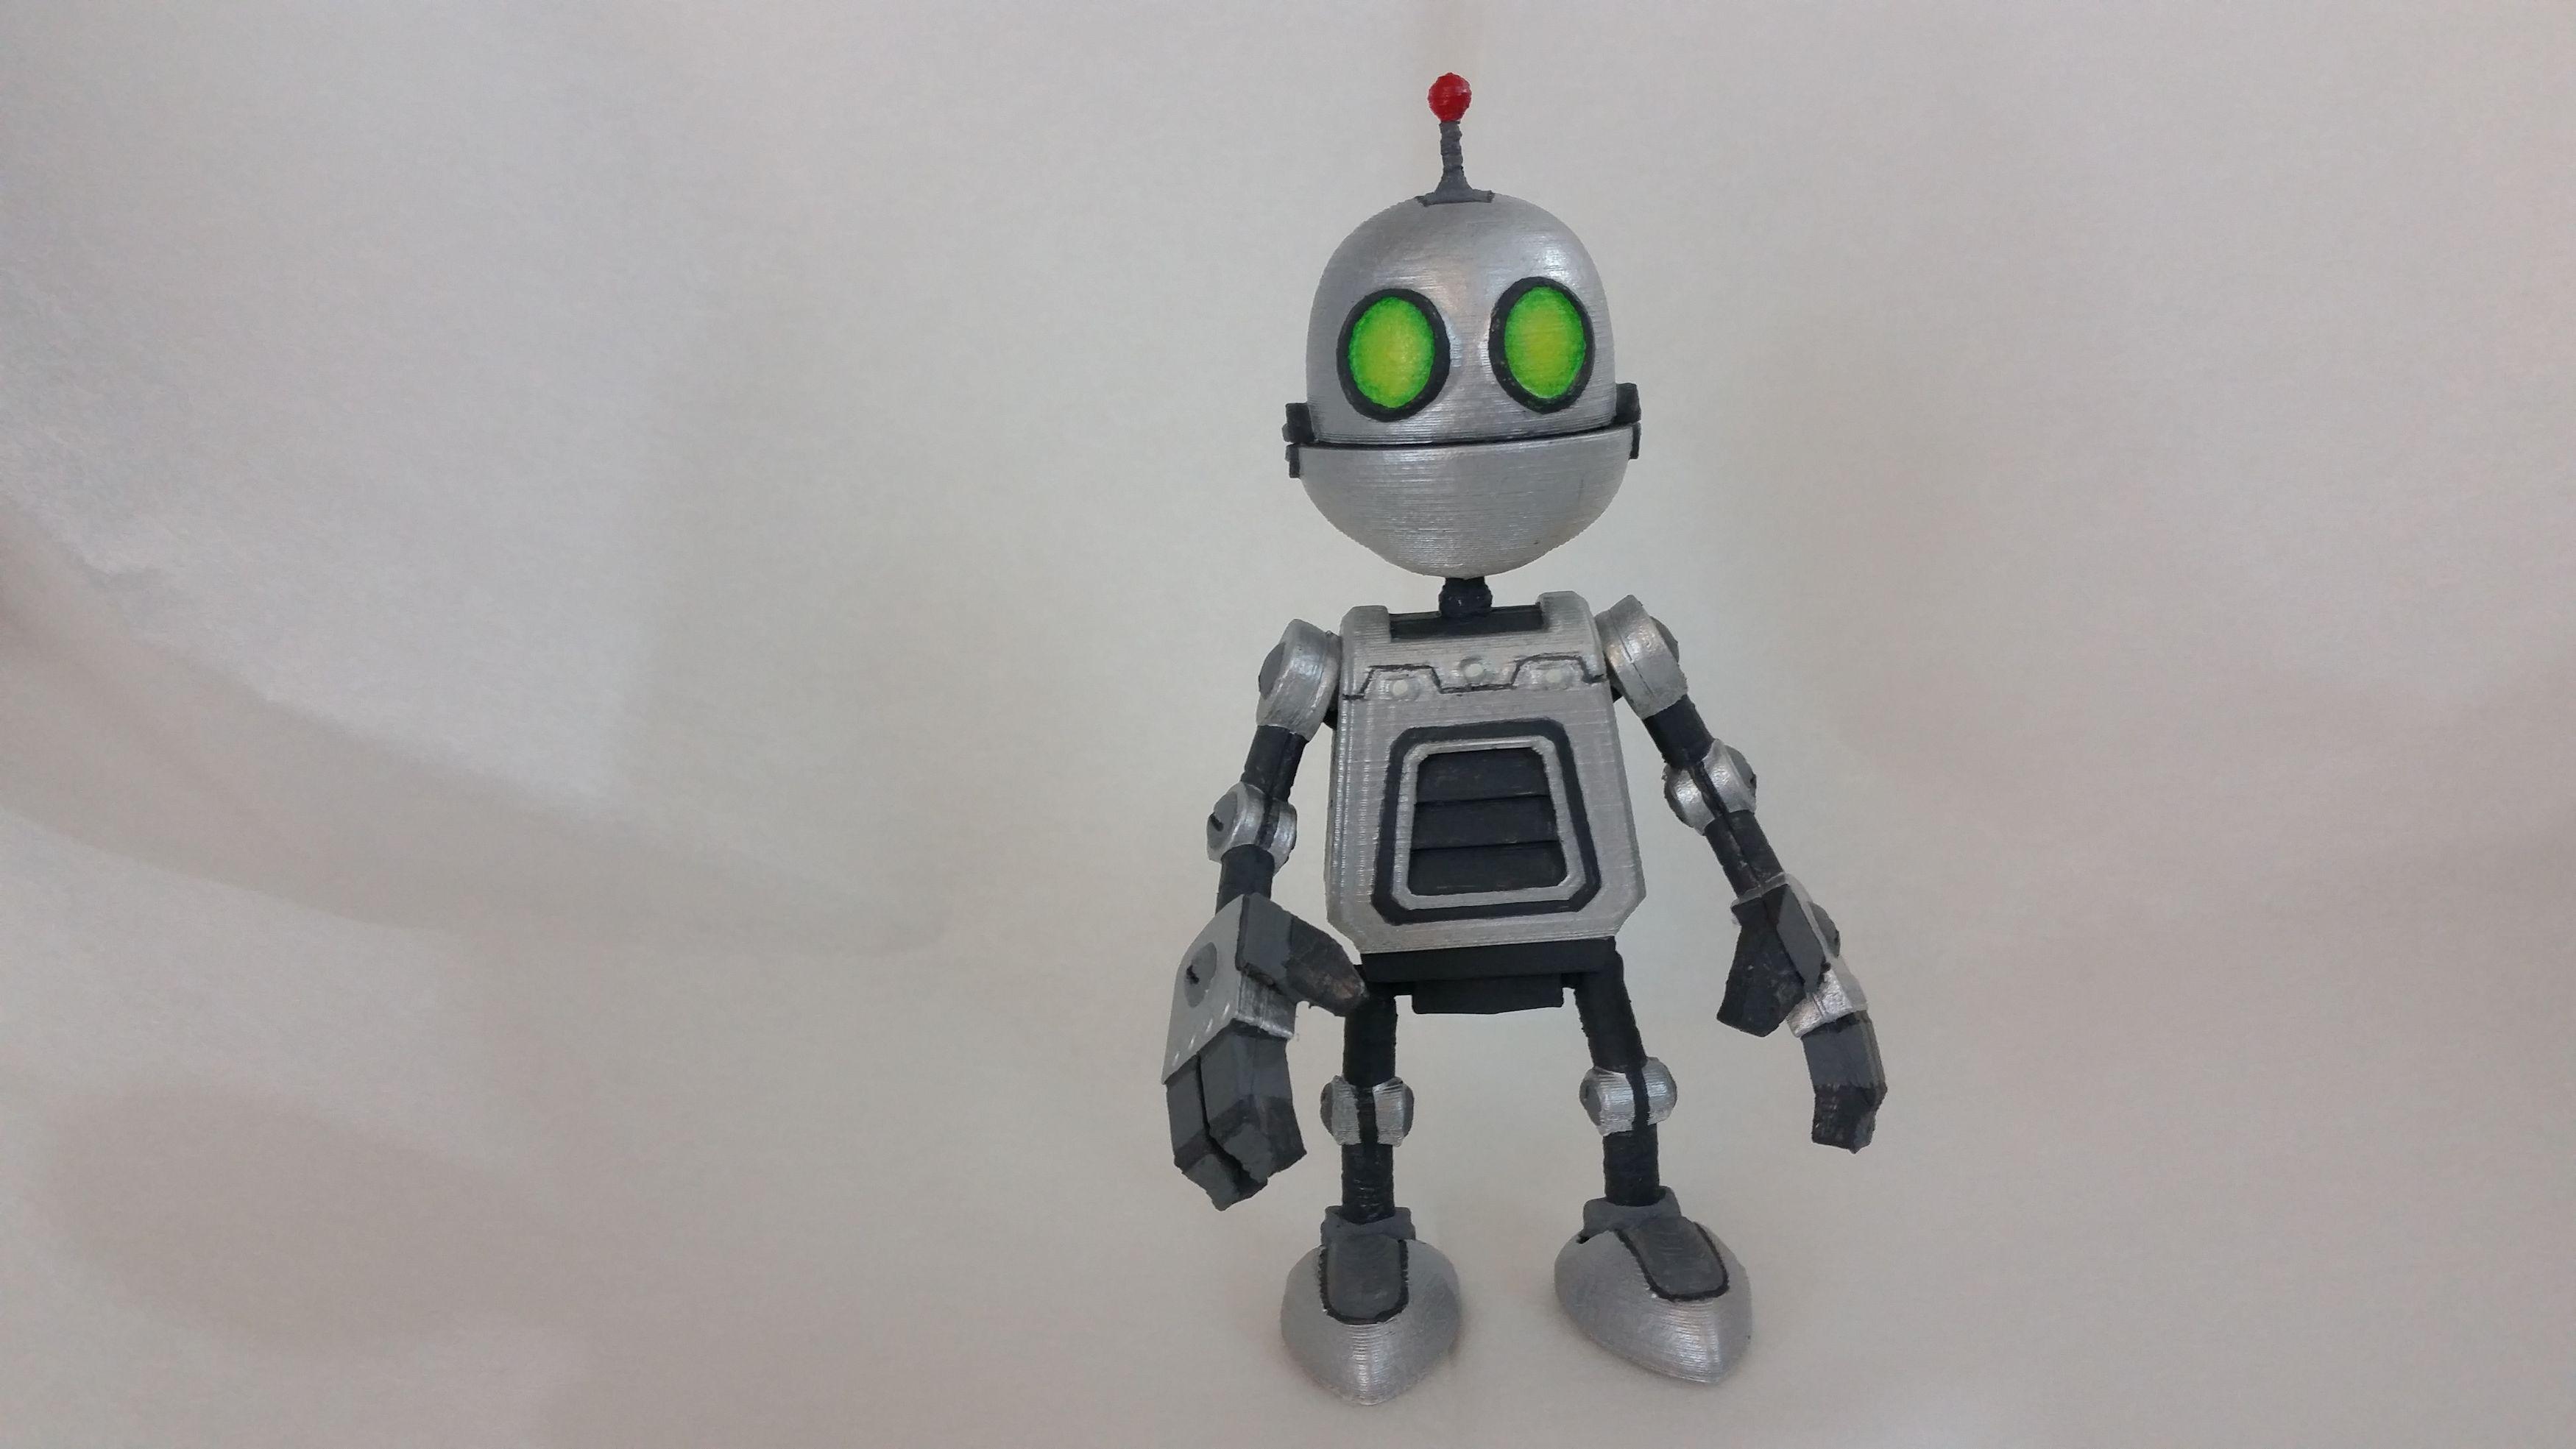 Clank Figure Ratchet Clank Autodesk Online Gallery